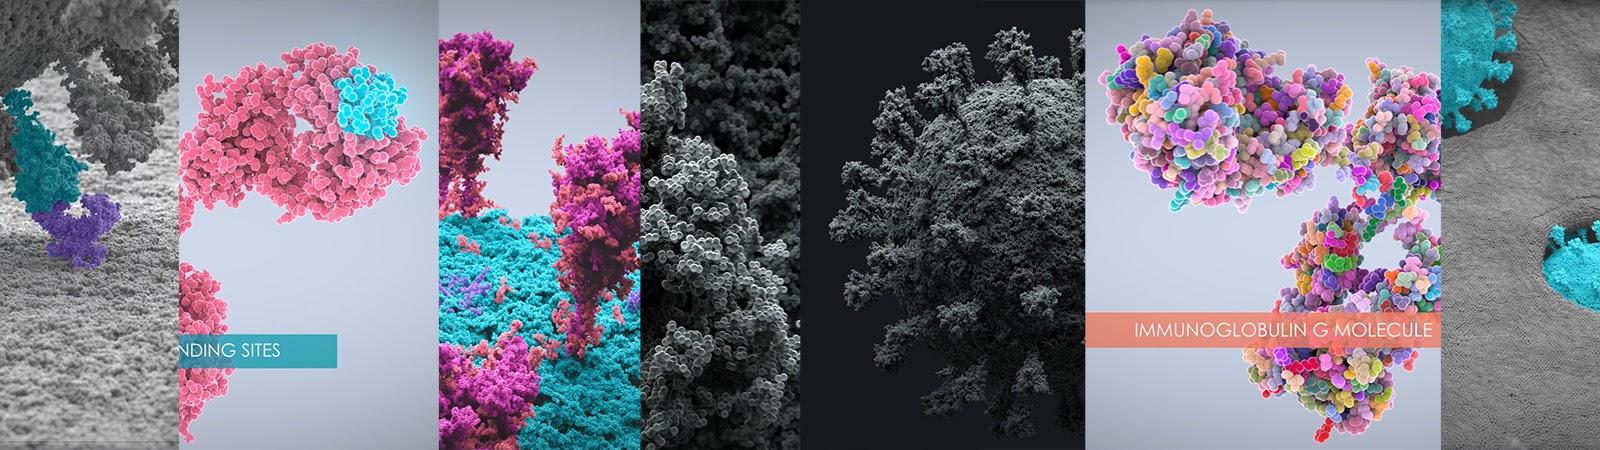 Молекулярная биология. Houdini. NVIDIA 3080. Коронавирус vs иммуноглобулины - 1